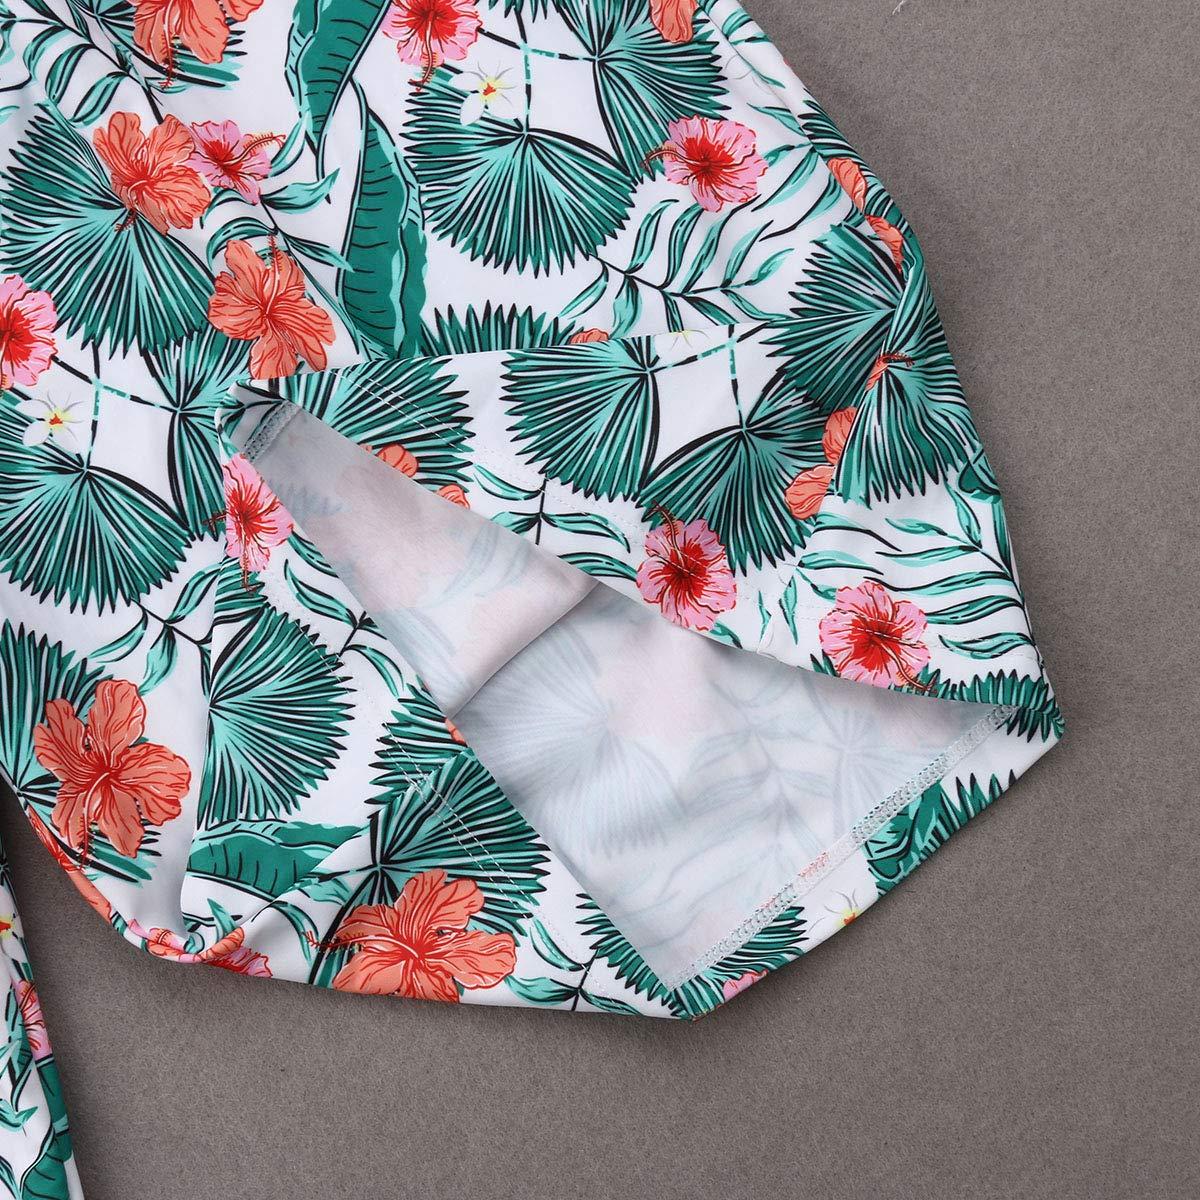 Family Matching Bathing Suit One Piece Floral Print Halter Monokini Women Baby Girls Swimsuit Swim Trunks for Men Boys